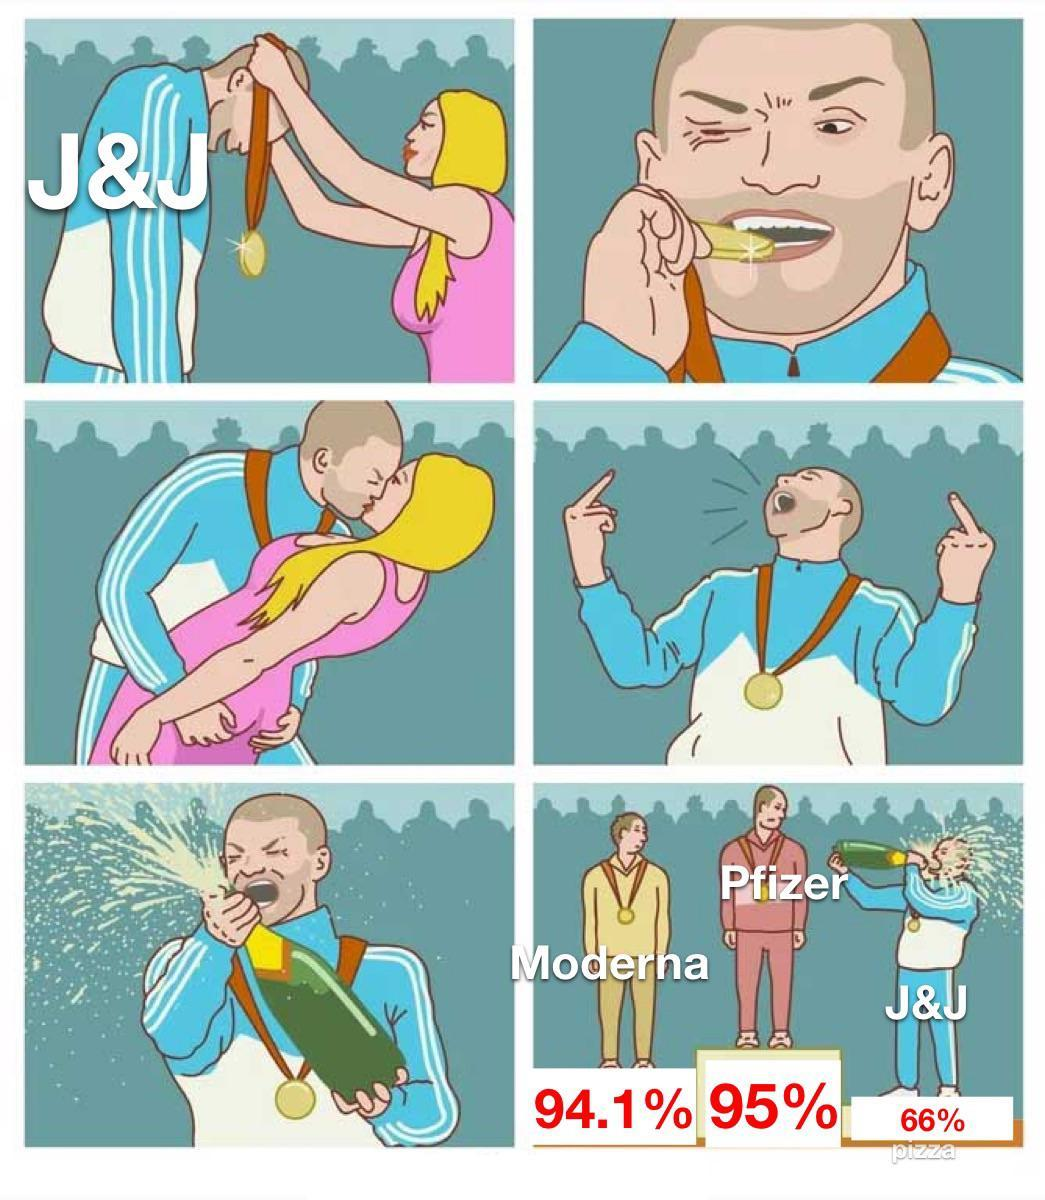 Johnson & Johnson vaccine be like - meme